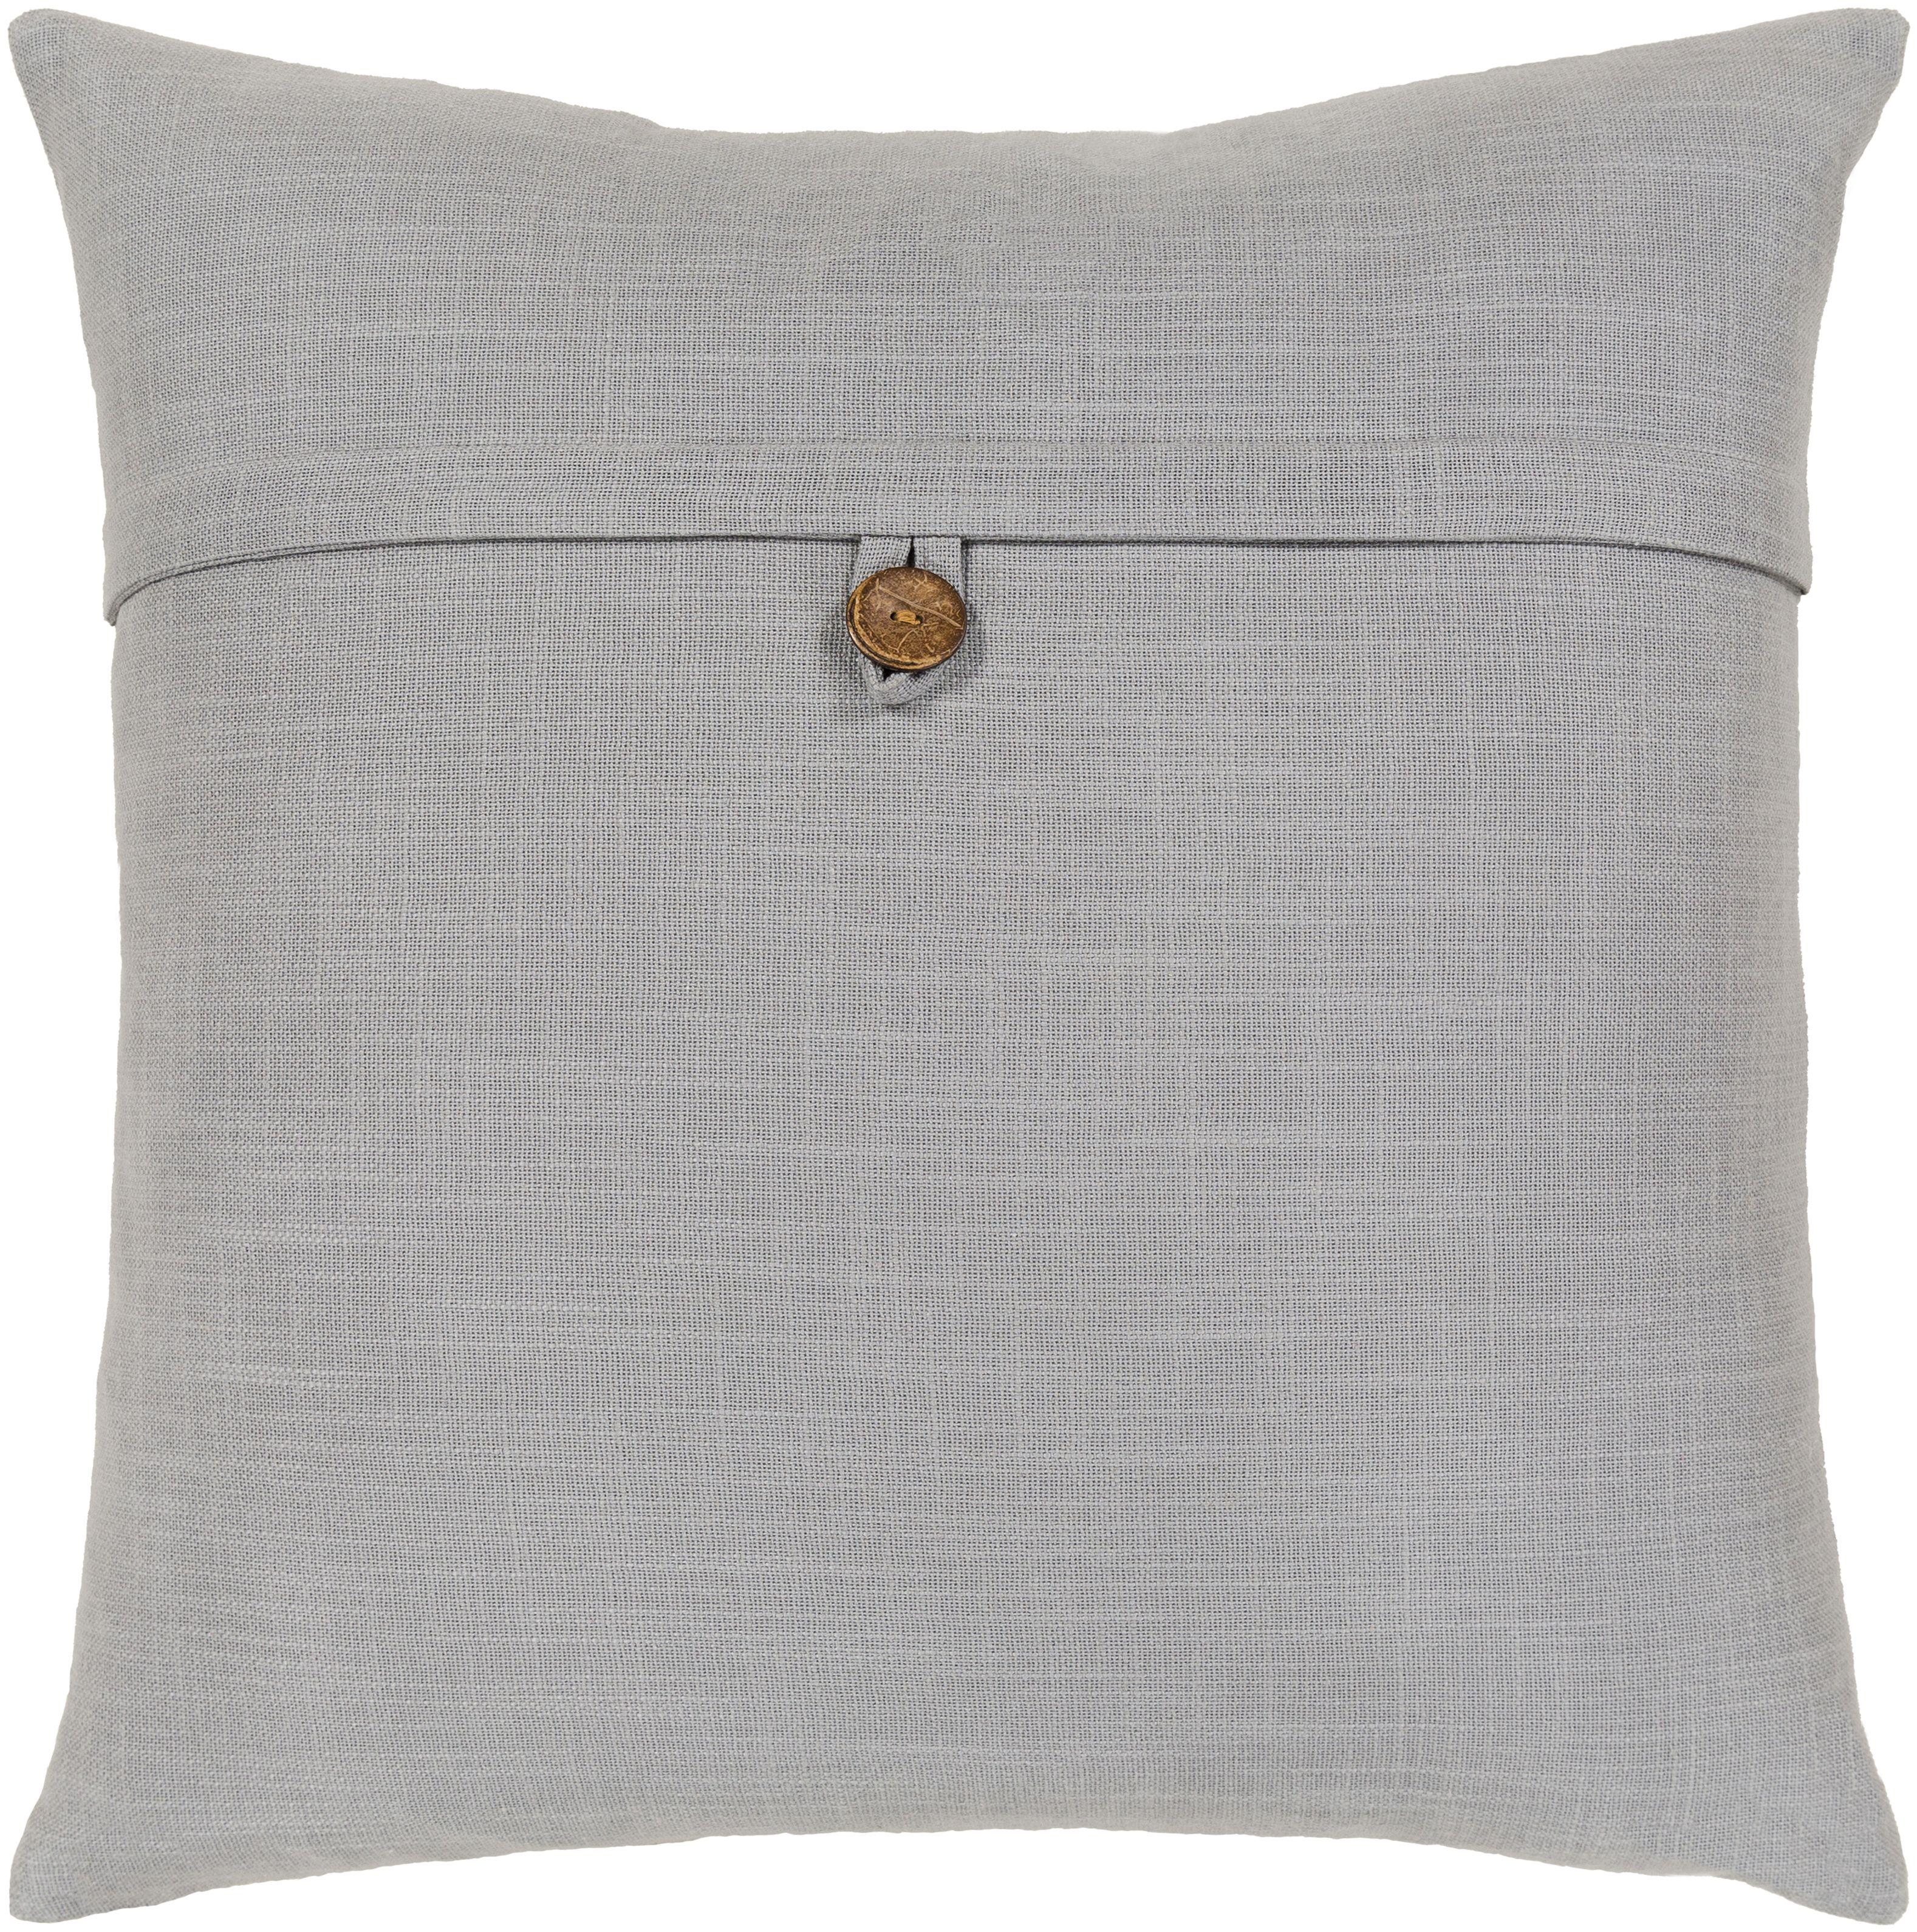 Jessie Pillow Light Gray Grey Throw Pillows Trending Decor